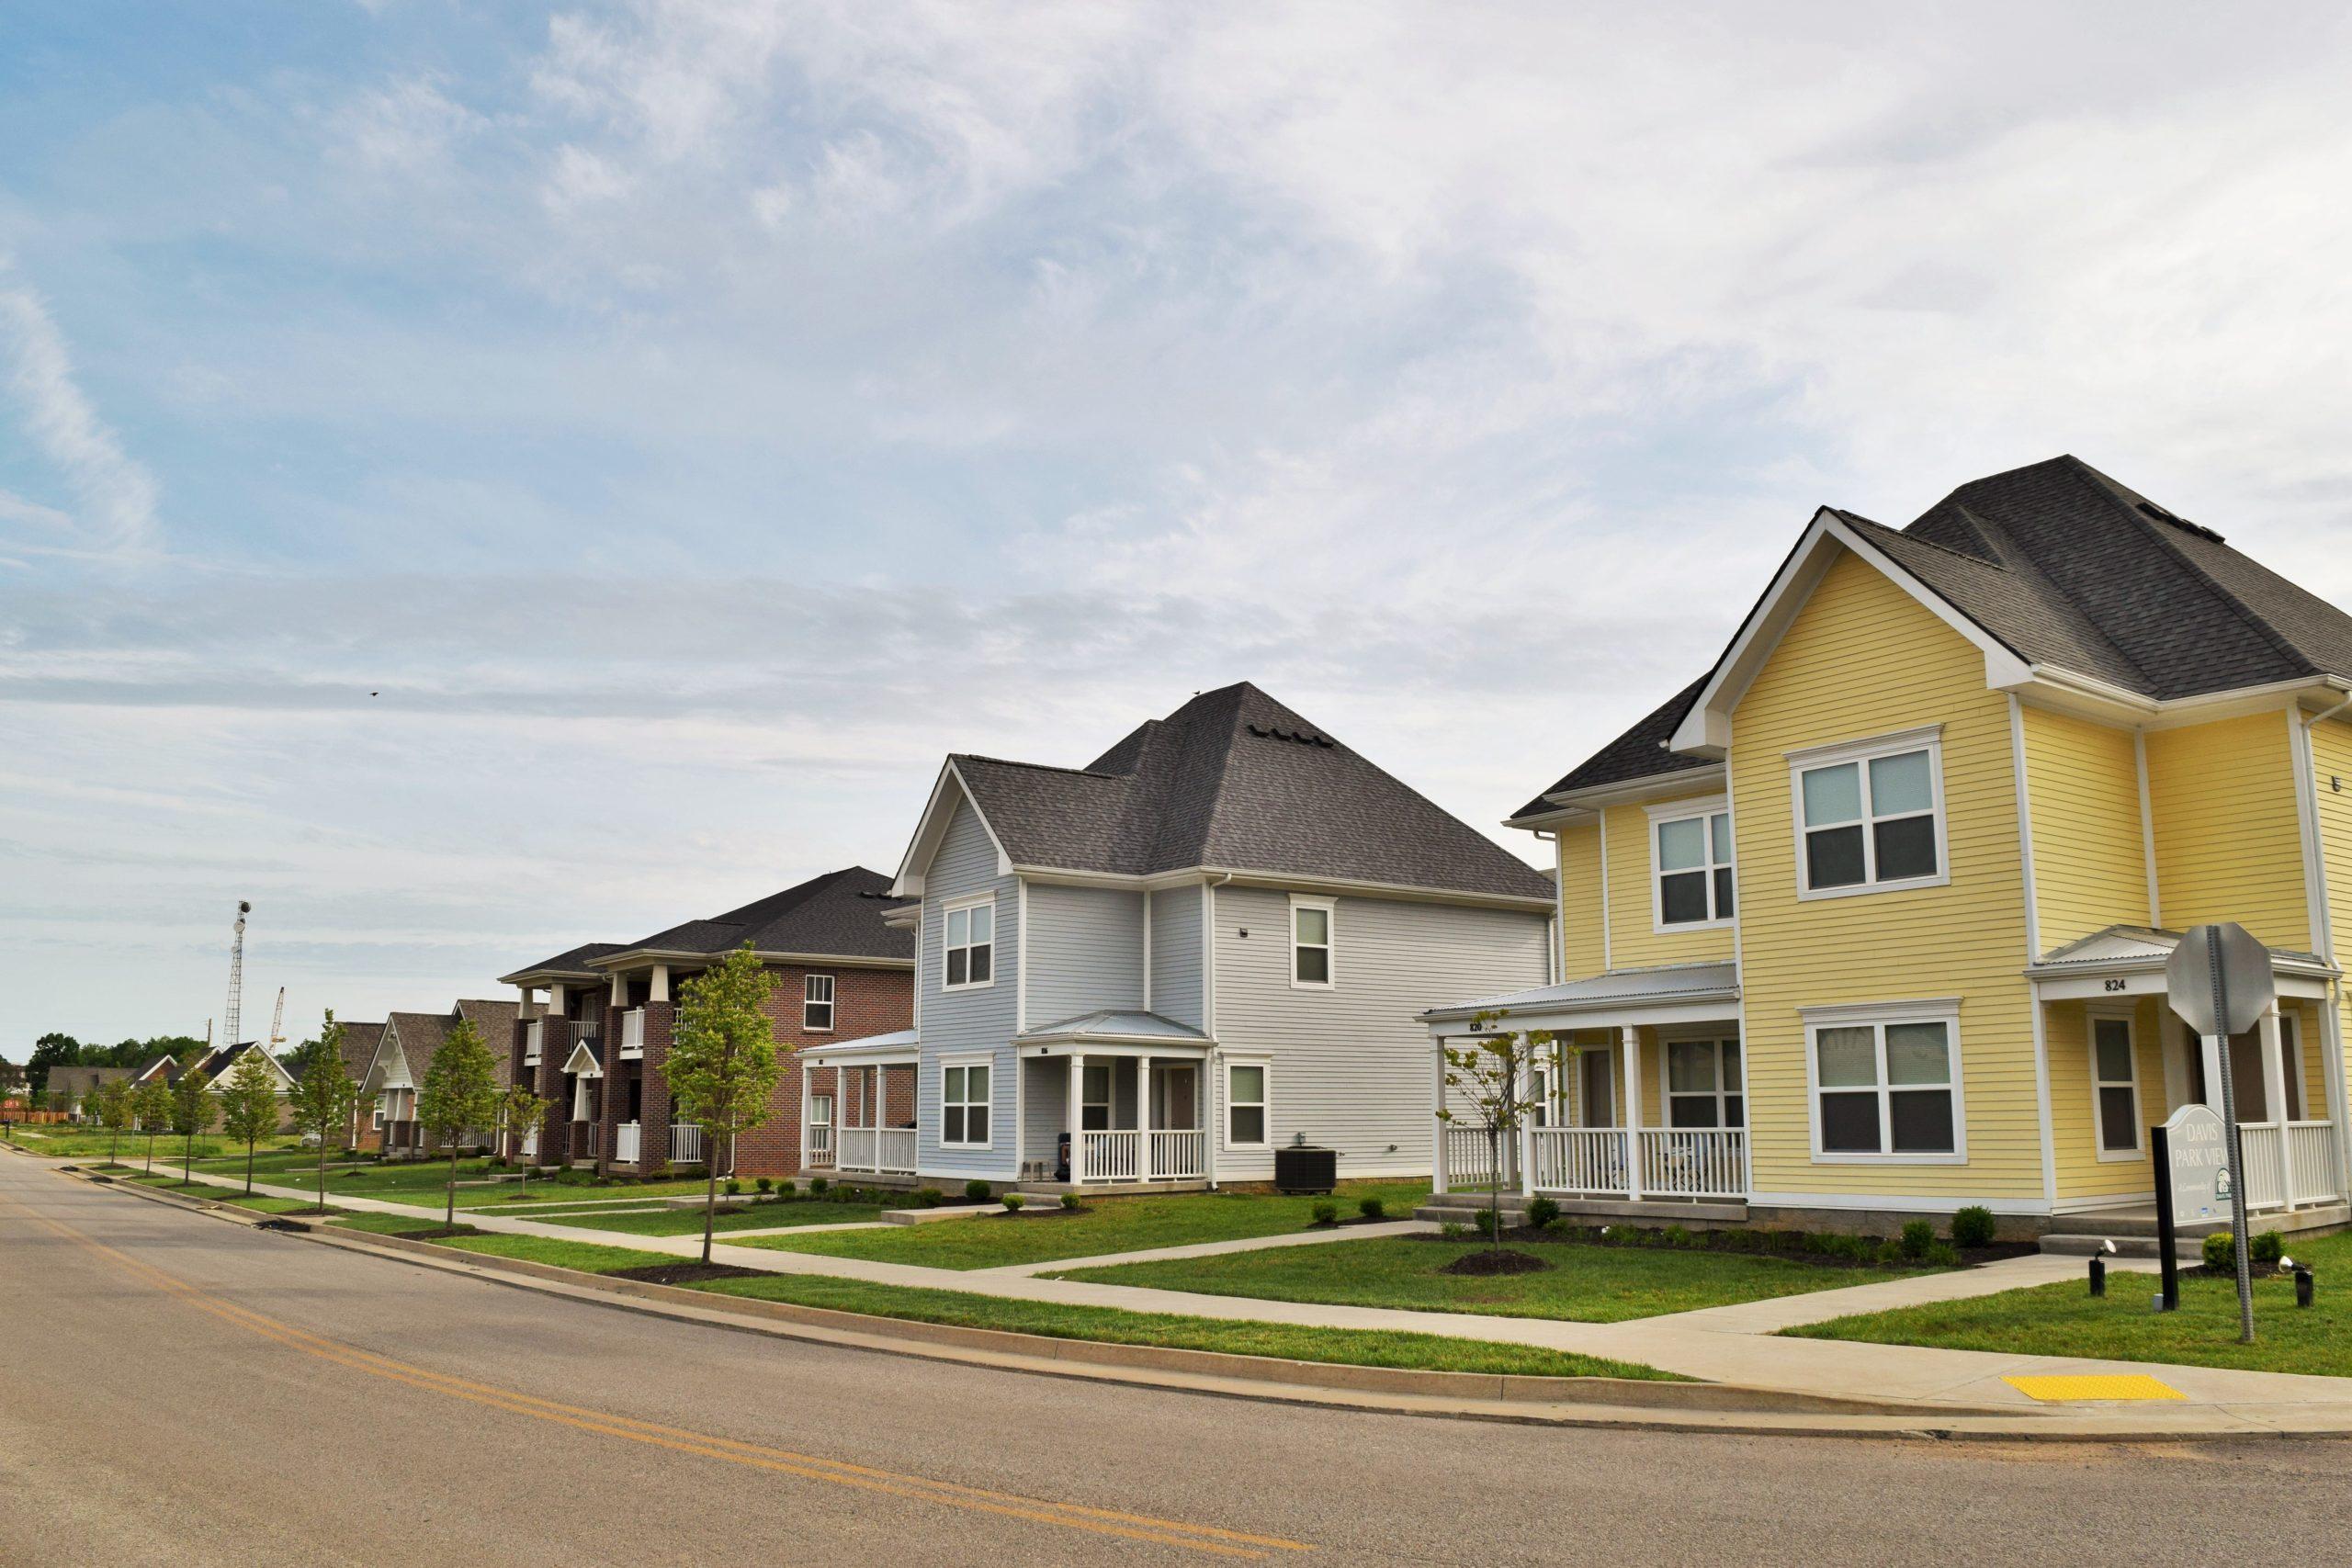 Housing Diversity & Affordability